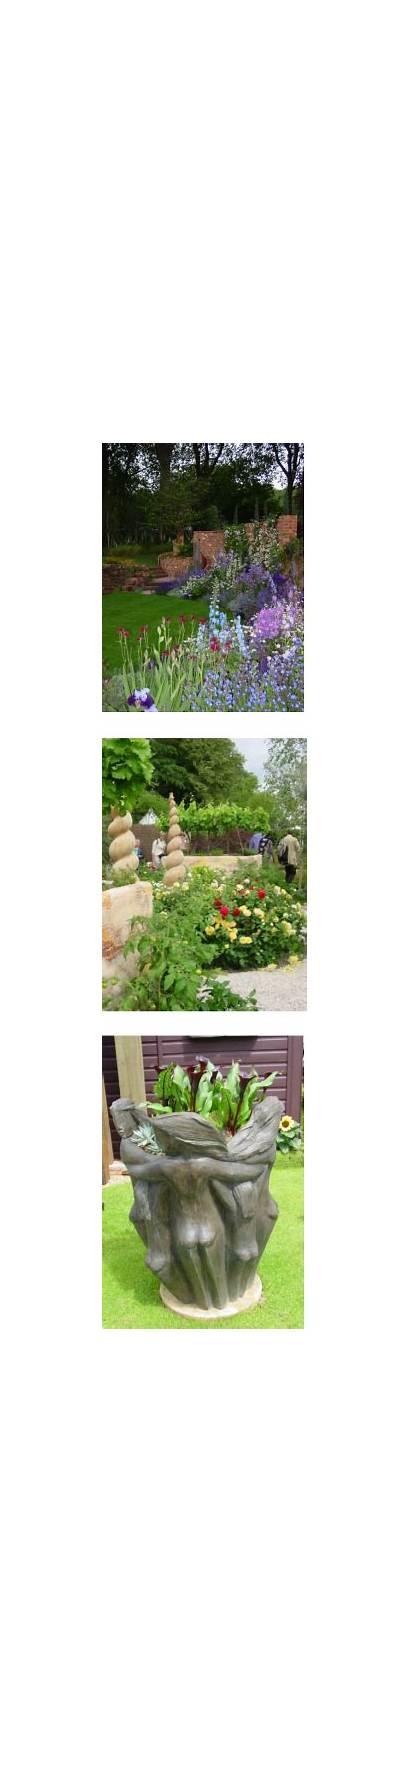 Sensory Gardens Care Dementia Garden Homes Landscape